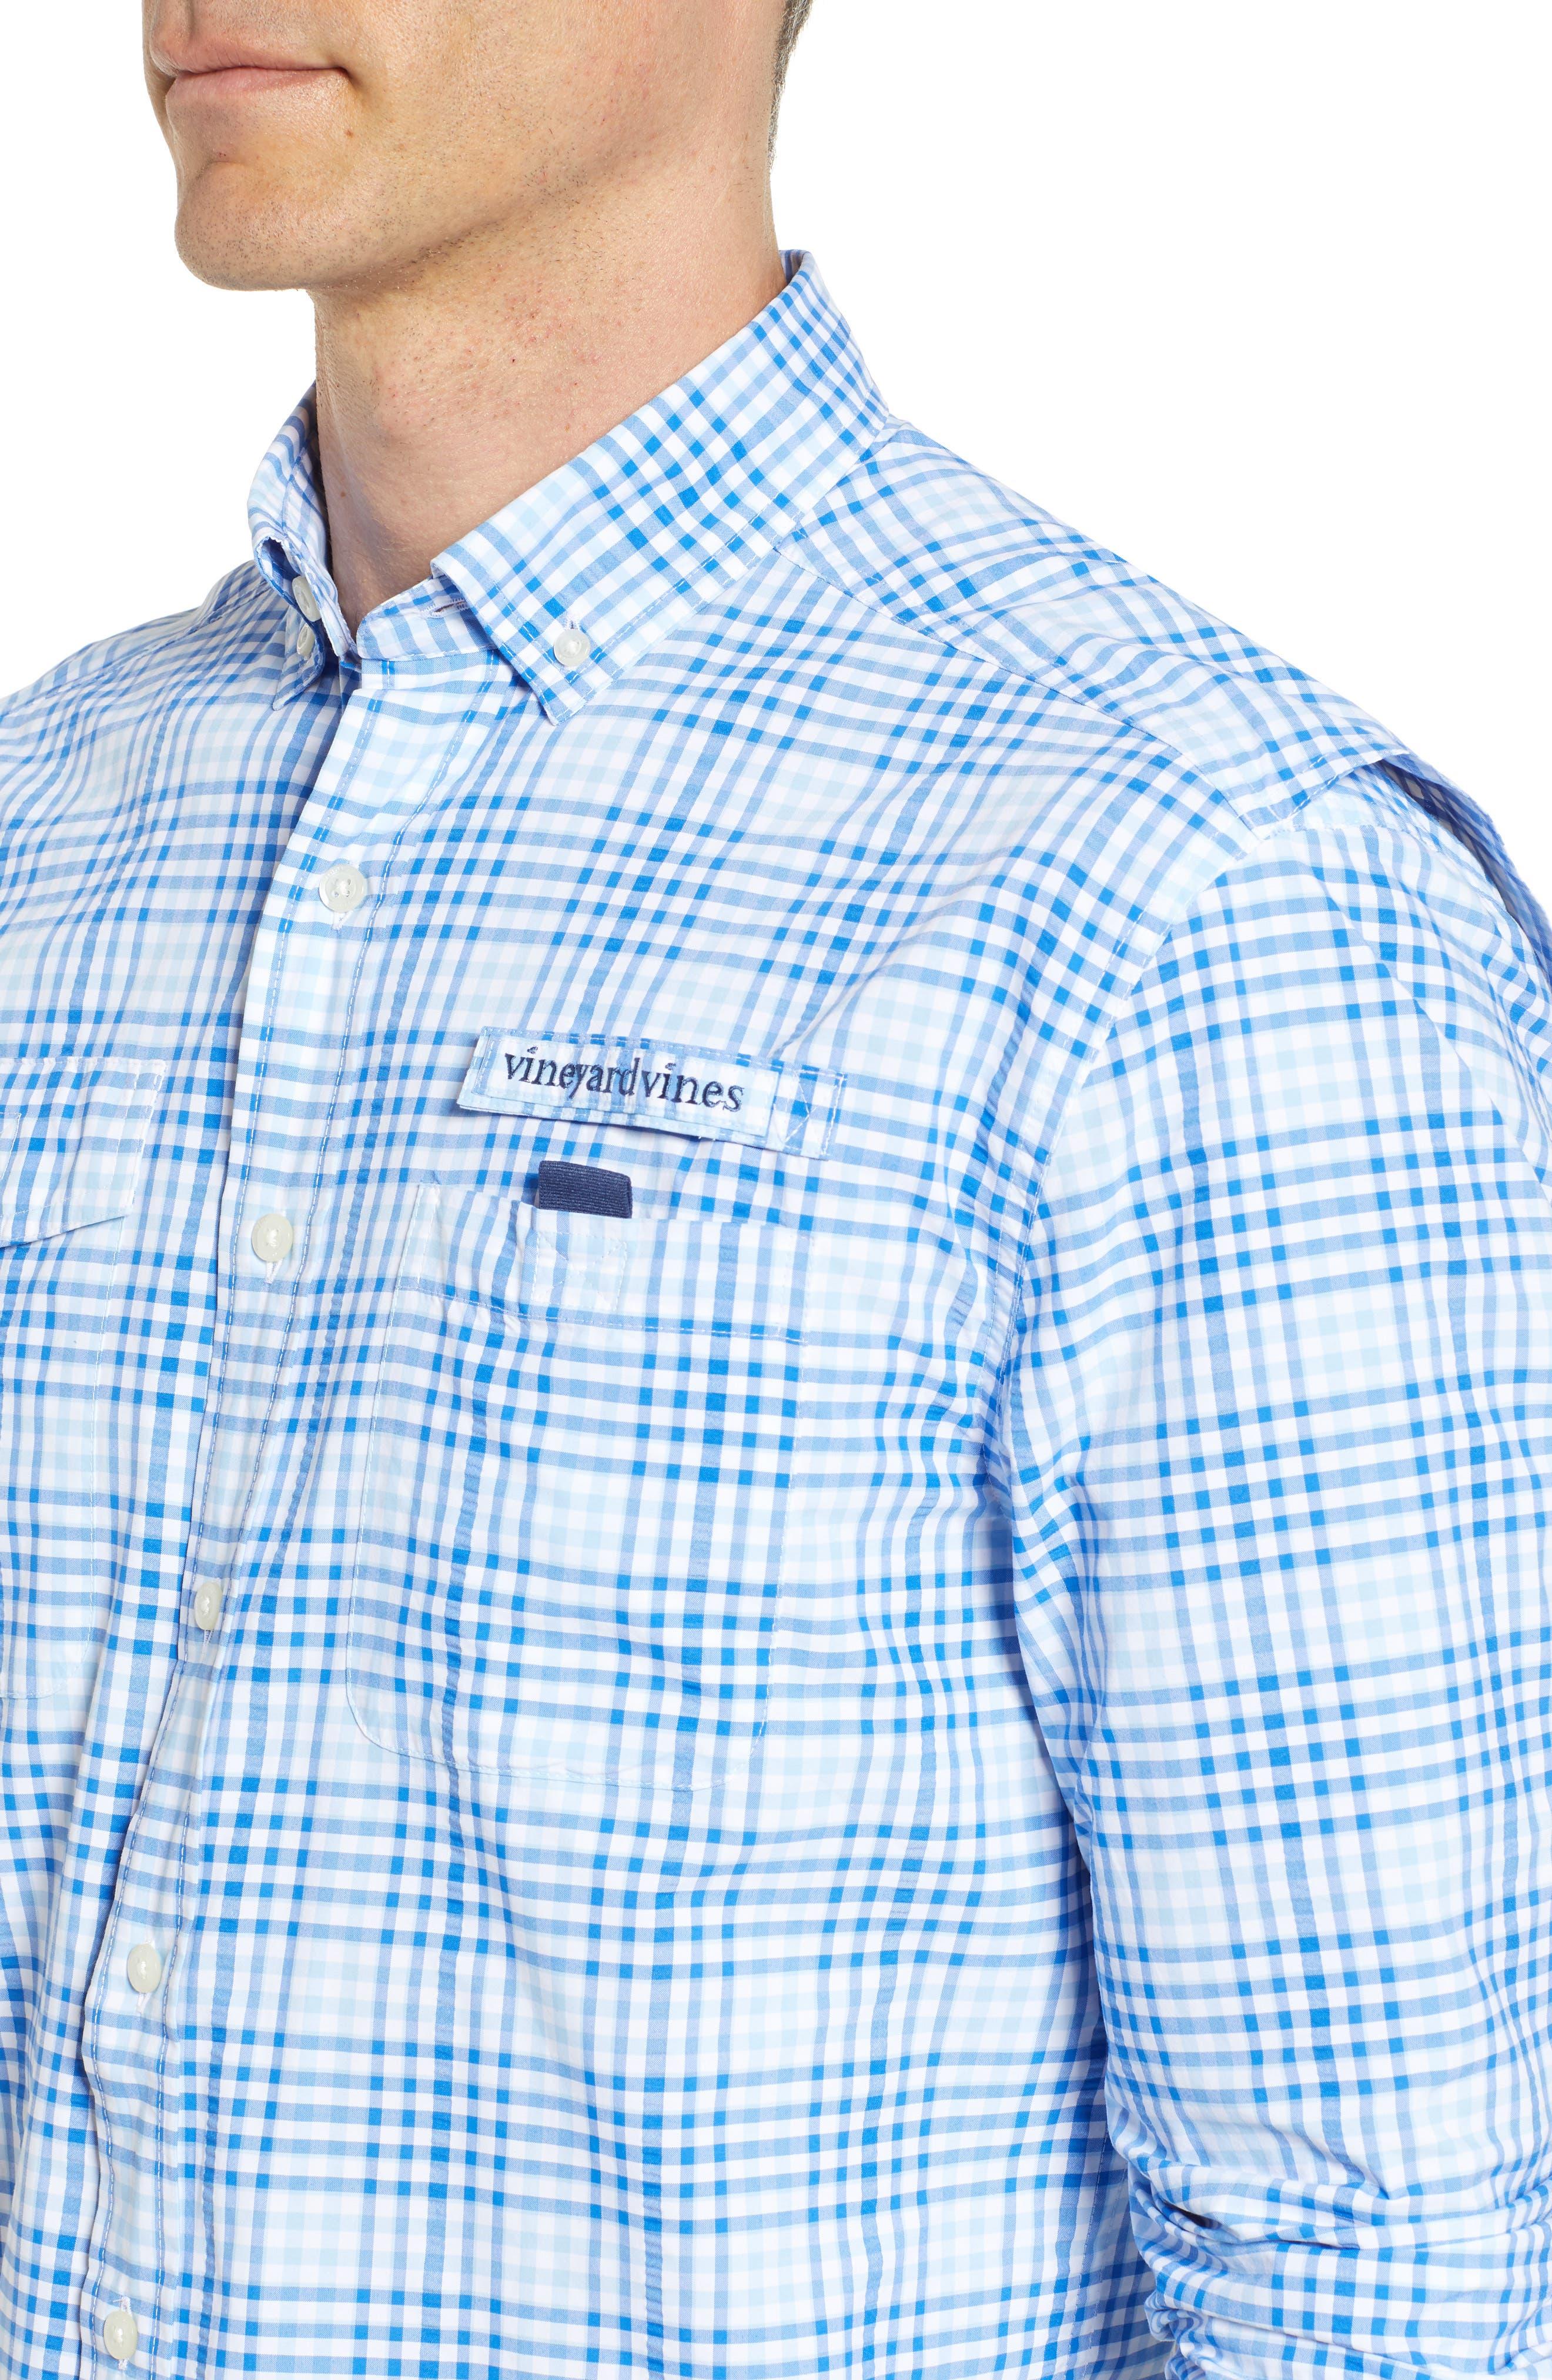 South Shore Harbor Regular Fit Plaid Performance Sport Shirt,                             Alternate thumbnail 2, color,                             Jake Blue